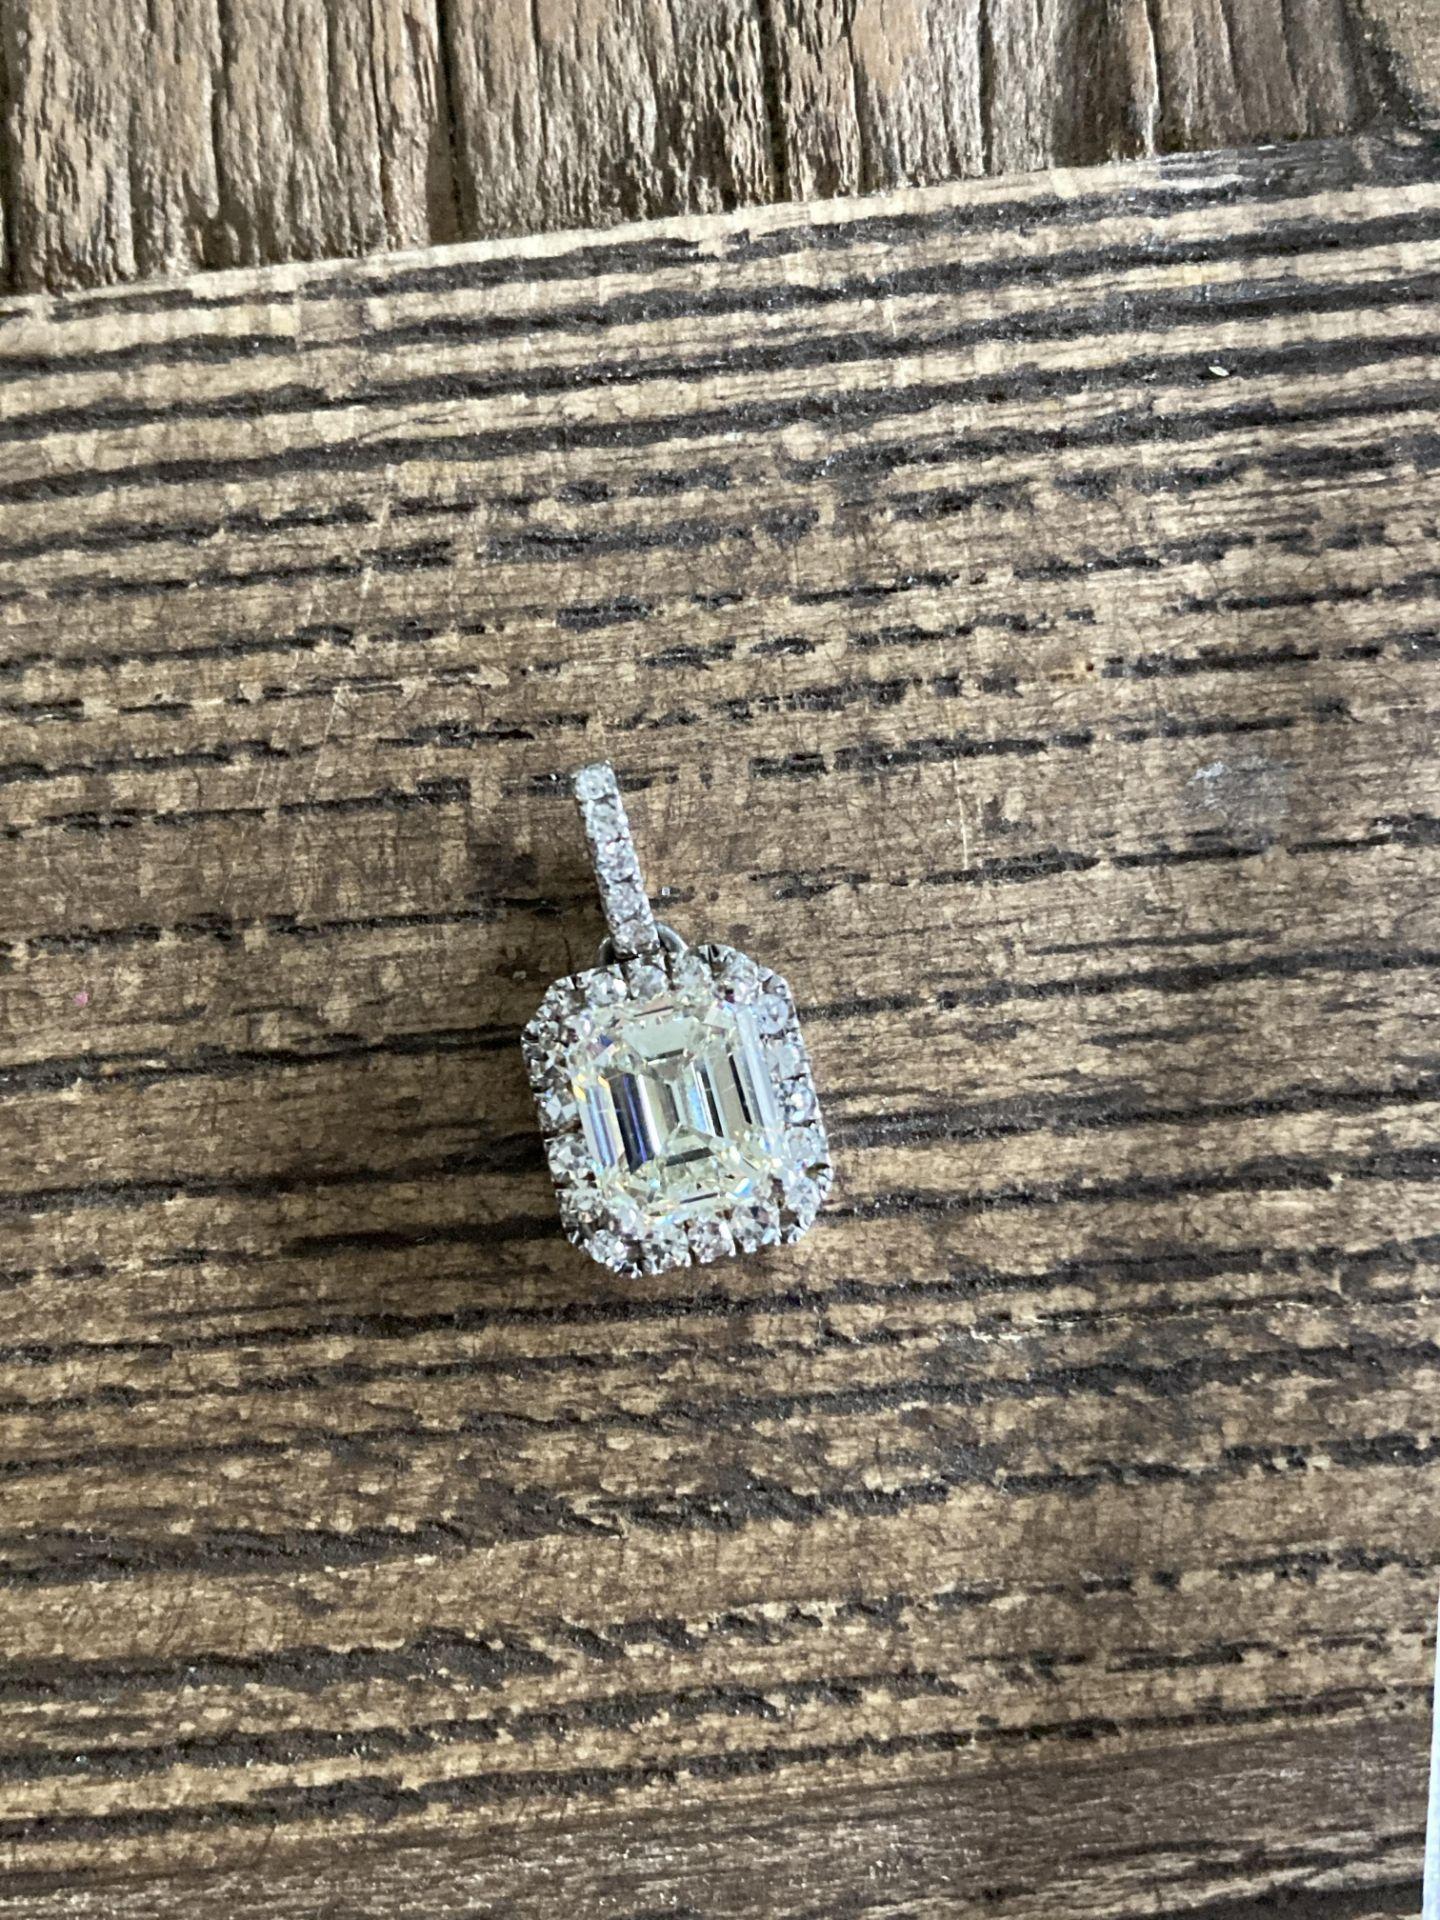 2.14CT DIAMOND PENDANT - 14K WHITE GOLD (WGI CERTIFICATE) - Image 2 of 4